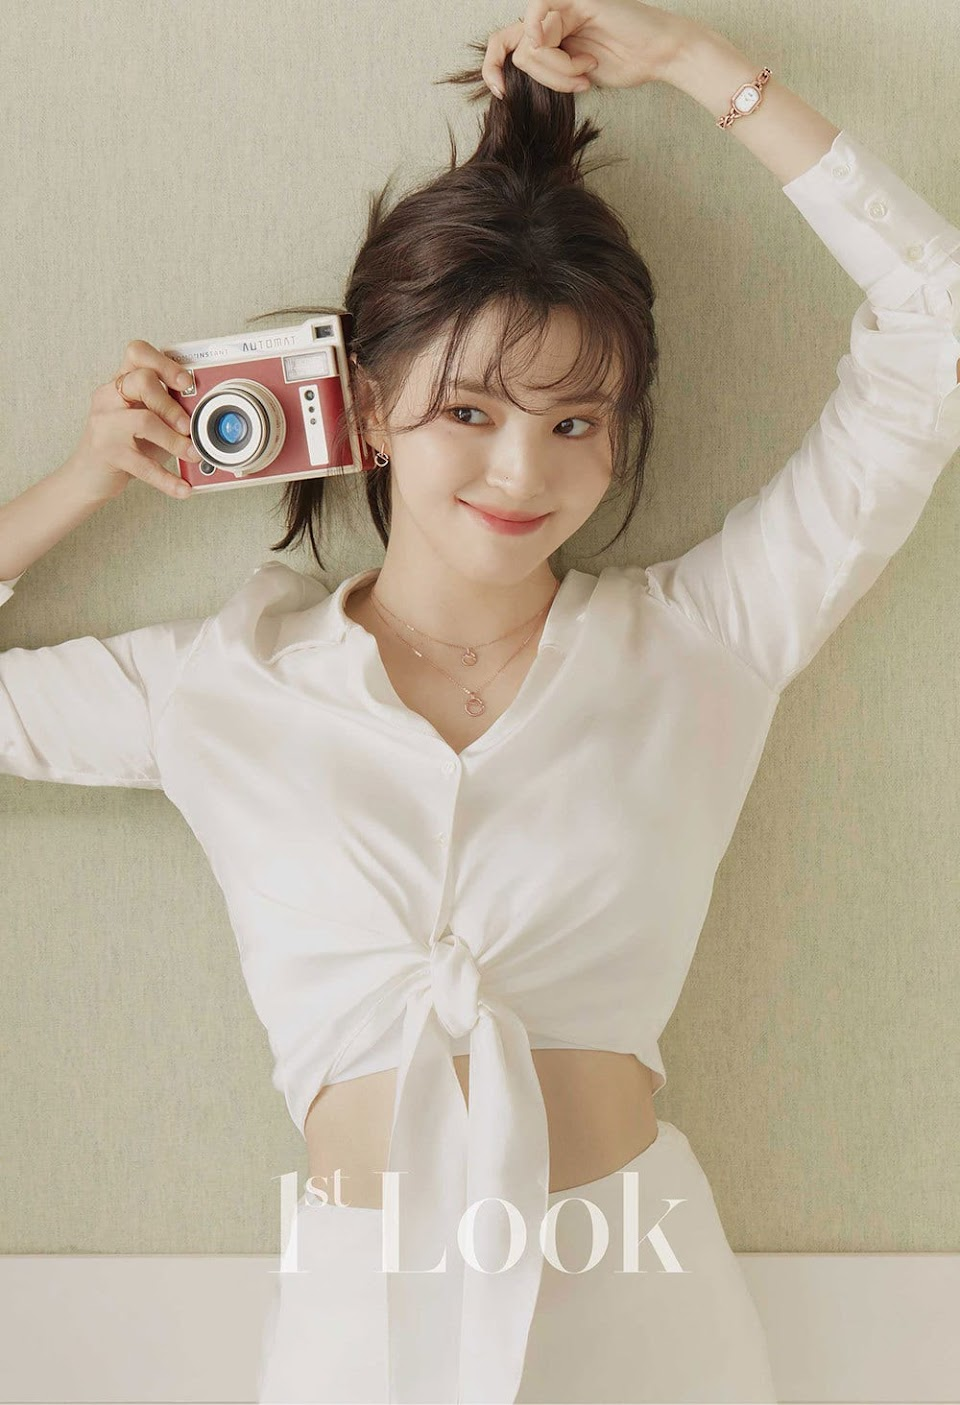 sohee photoshoot 9